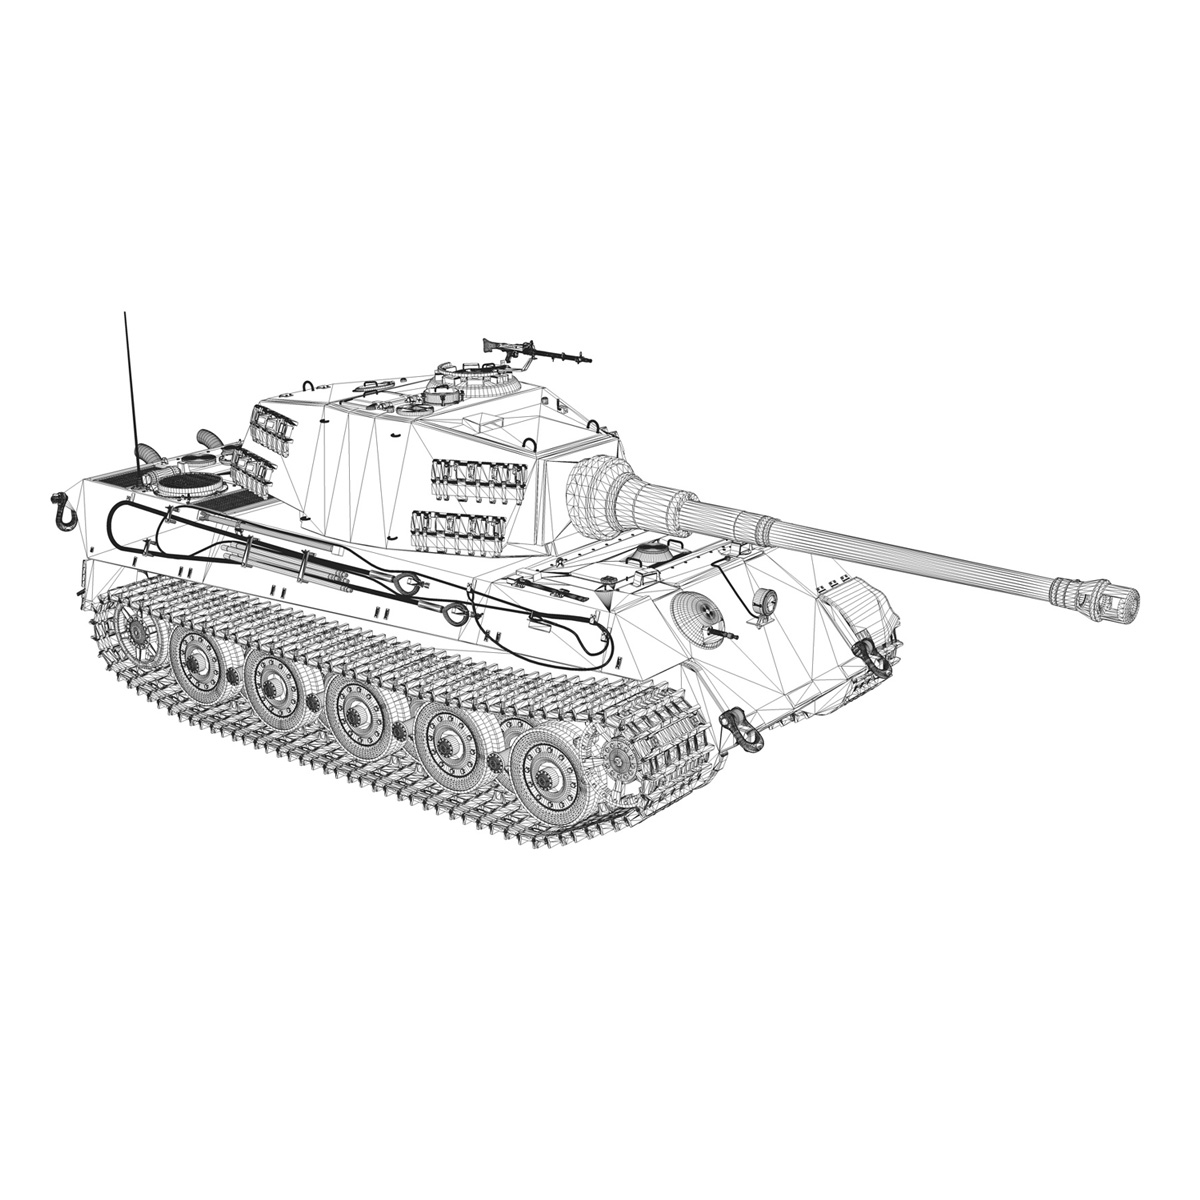 Panzerkampfwagen VI - Ausf B - Tiger II - 124 3d model 3ds c4d lwo lws lw obj 273765